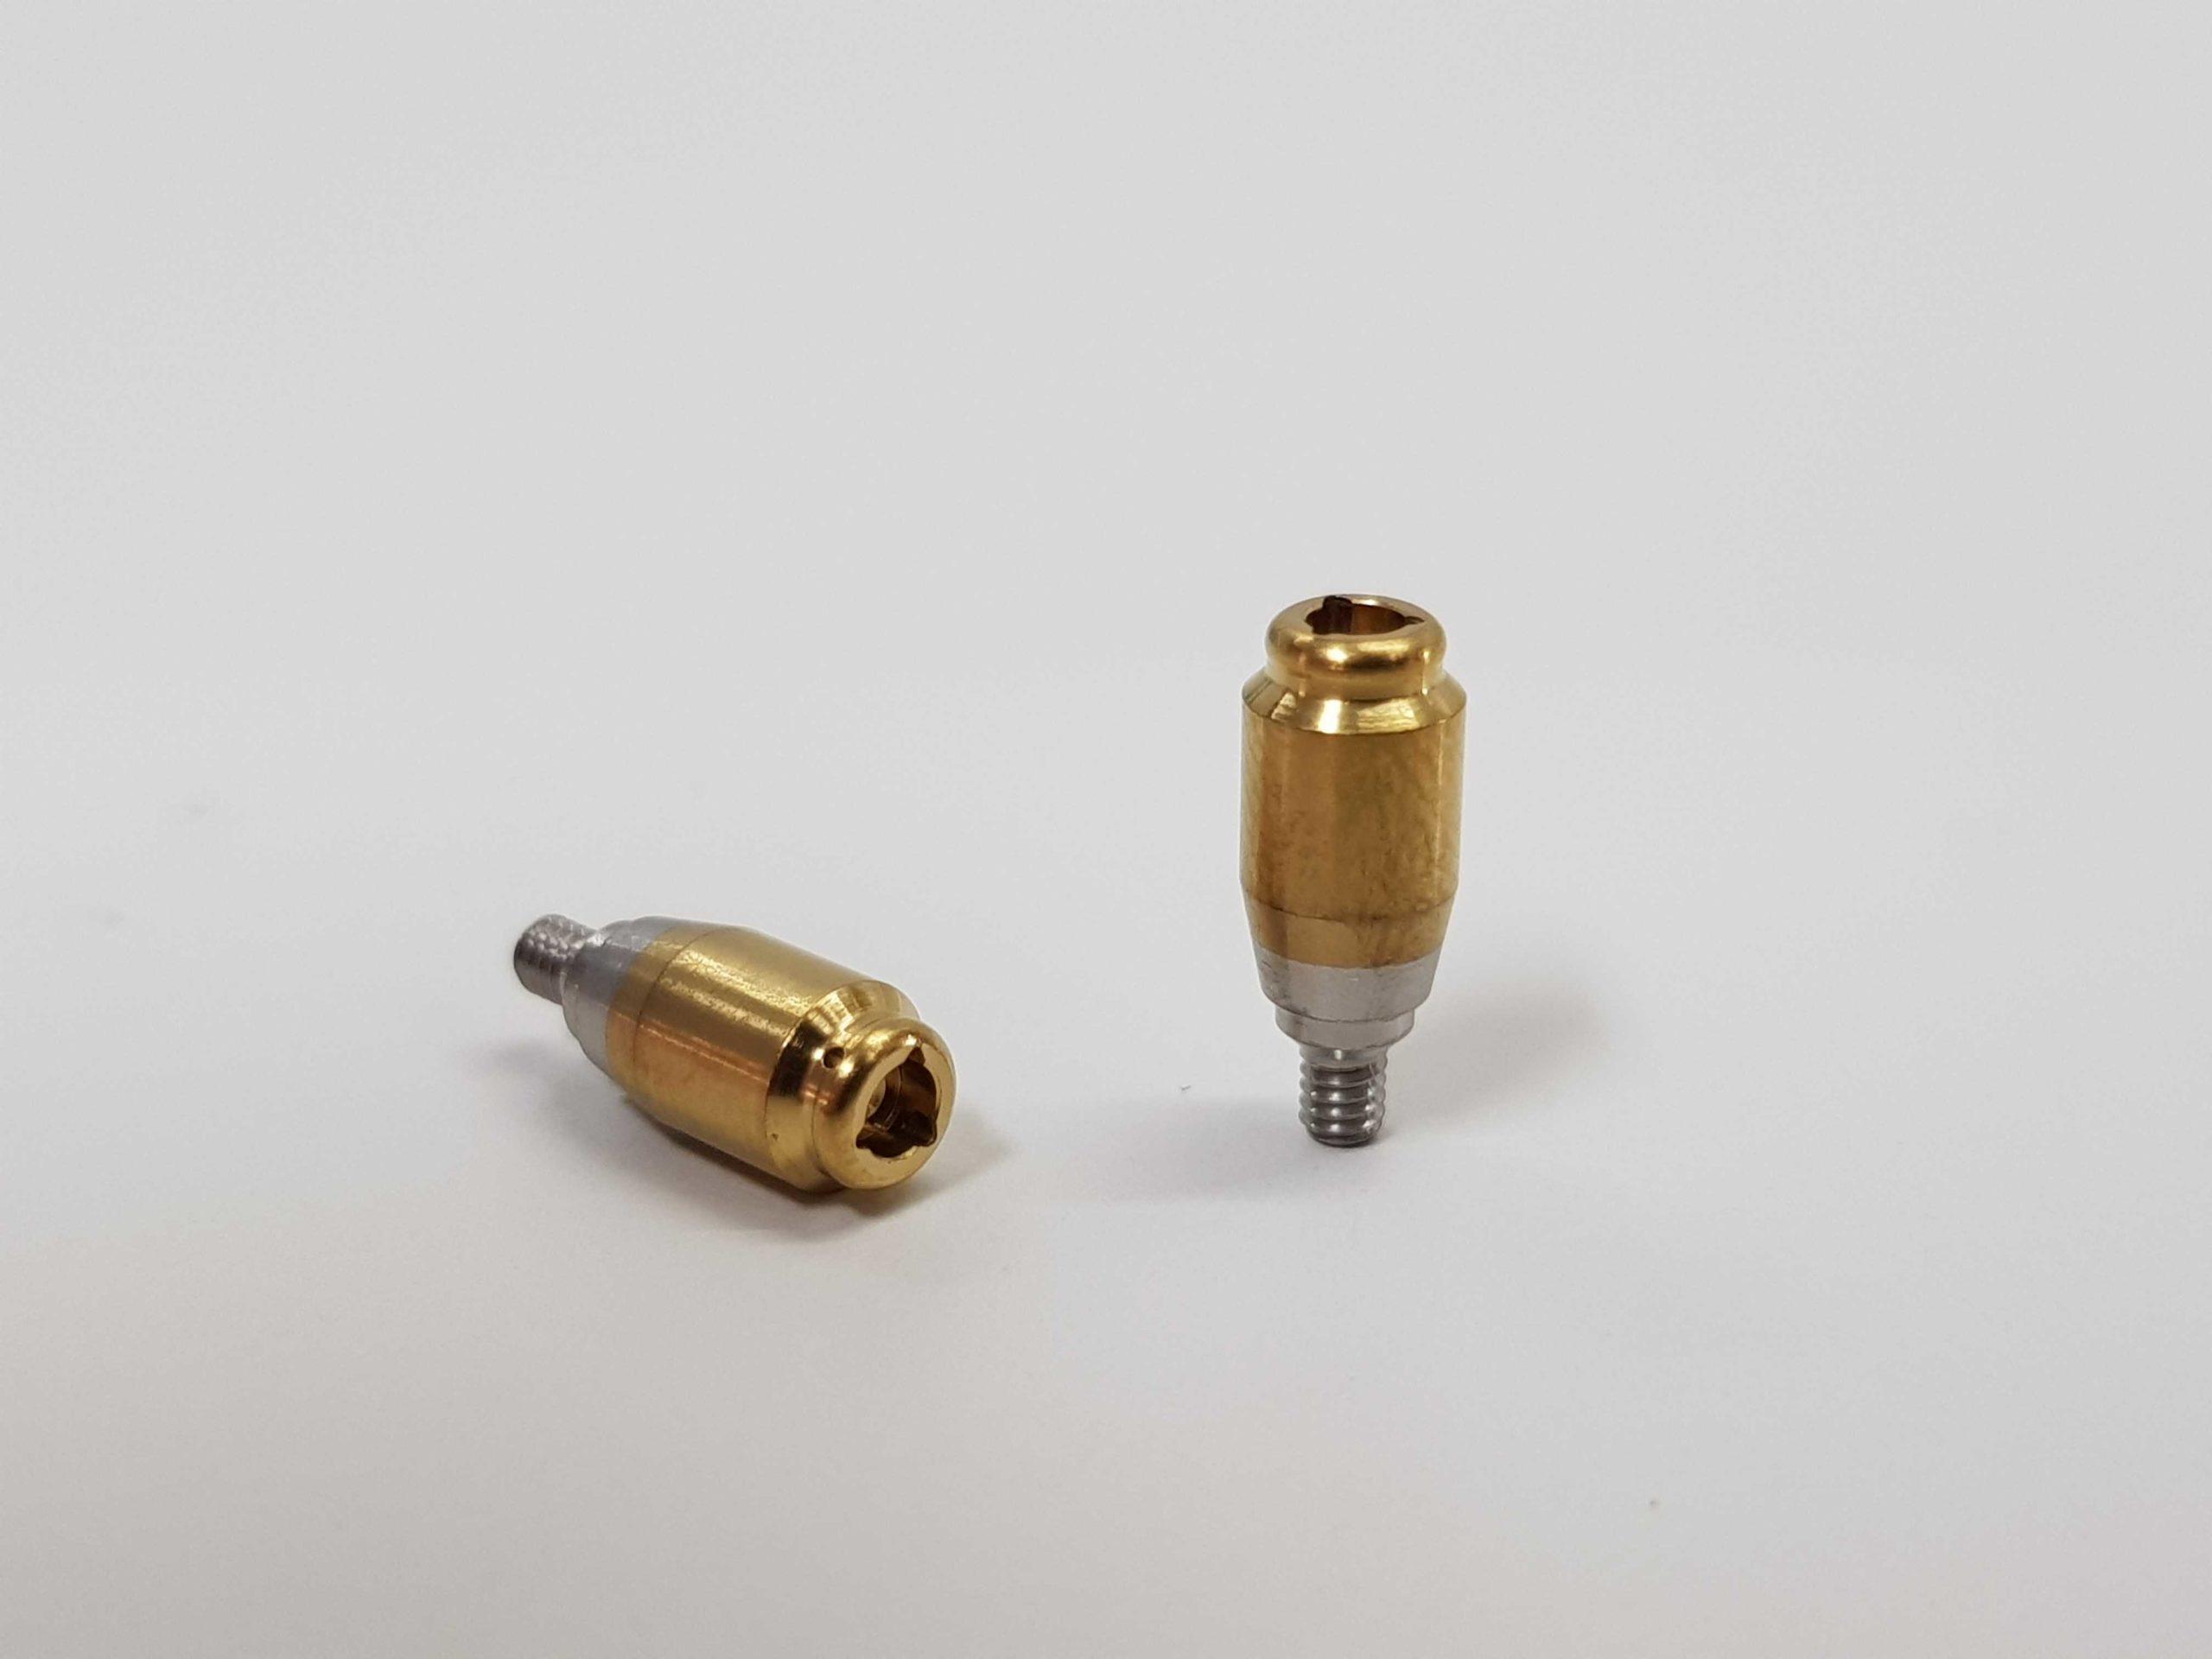 5mm Astra 5.4EV LOCATOR®